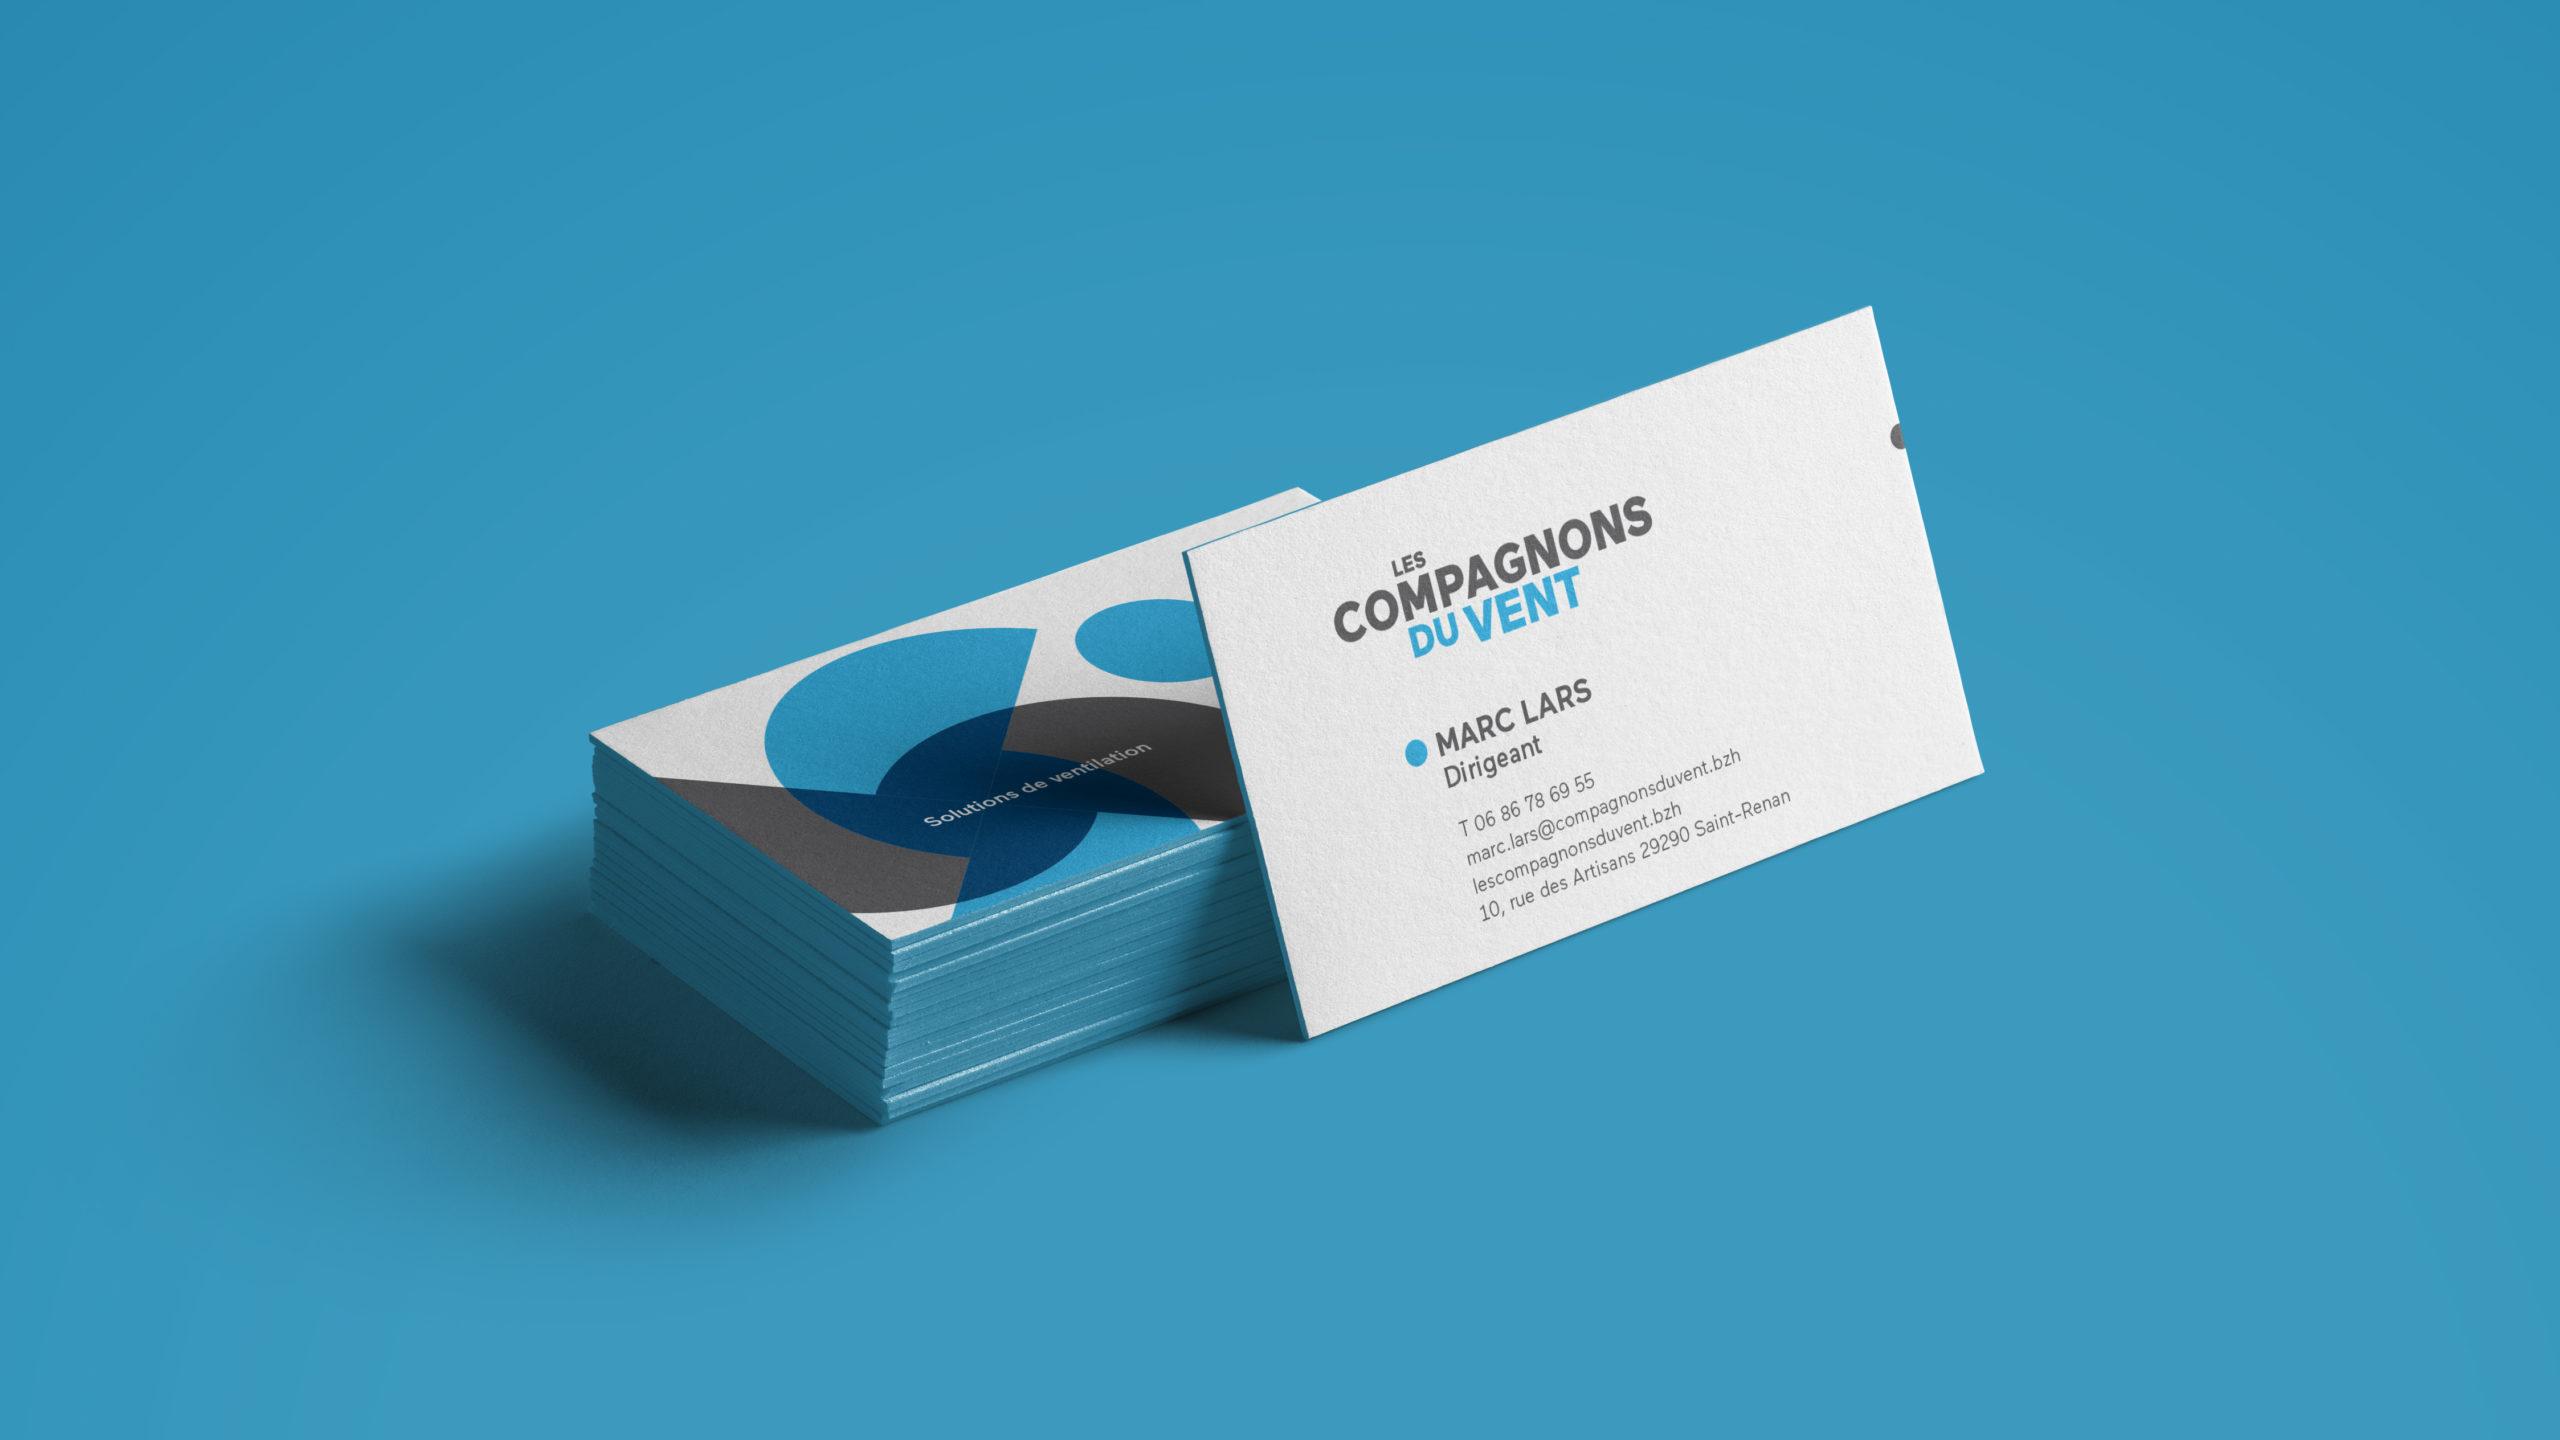 Compagnons Du Vent Identite Visuelle Logotype Carte Visite Scaled